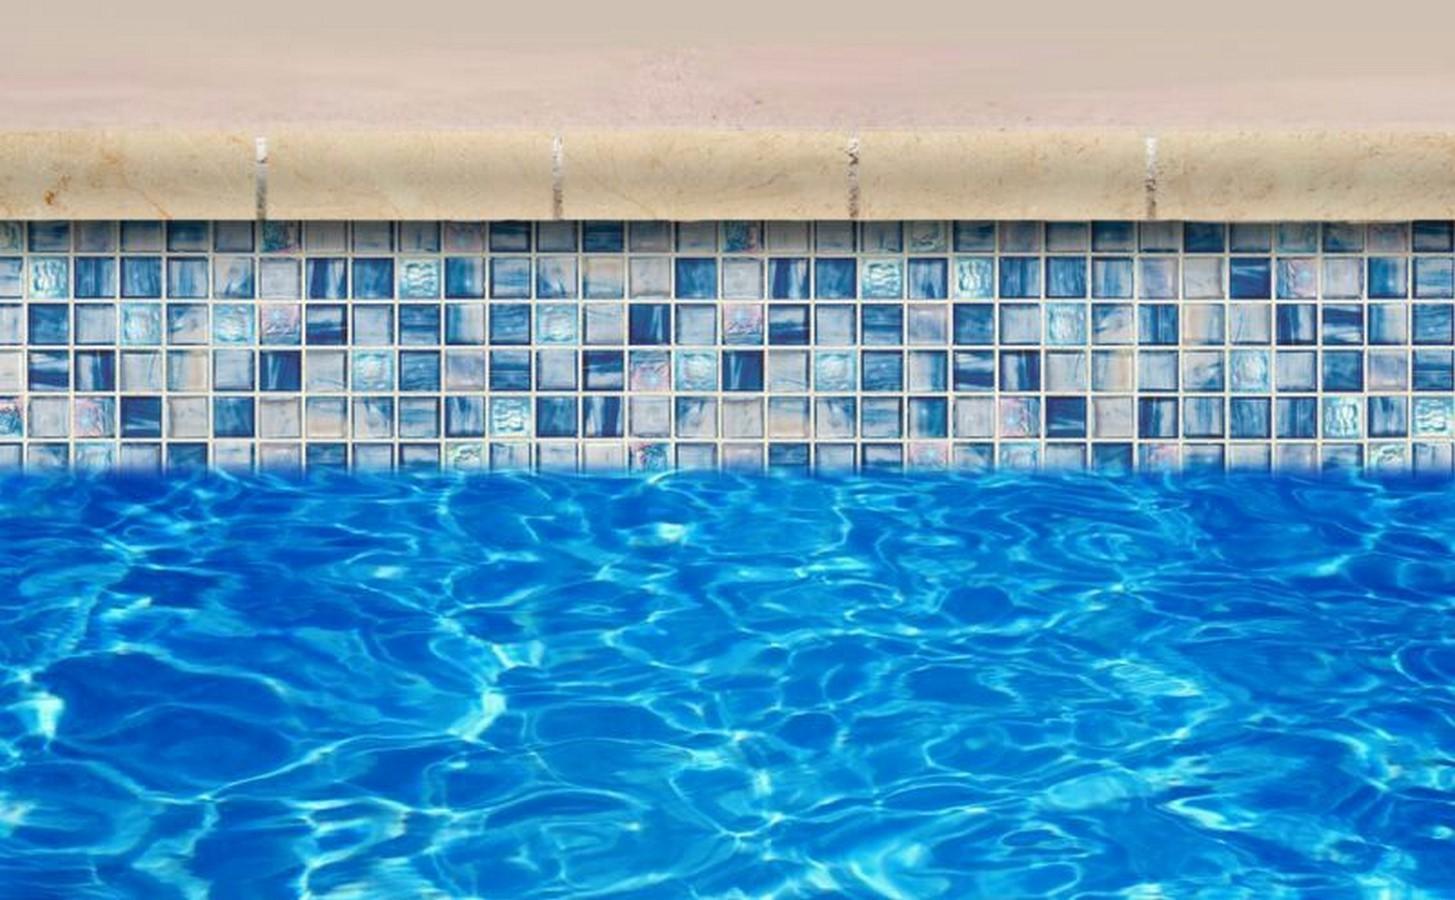 25 flooring patterns for Swimming Pools - Sheet10